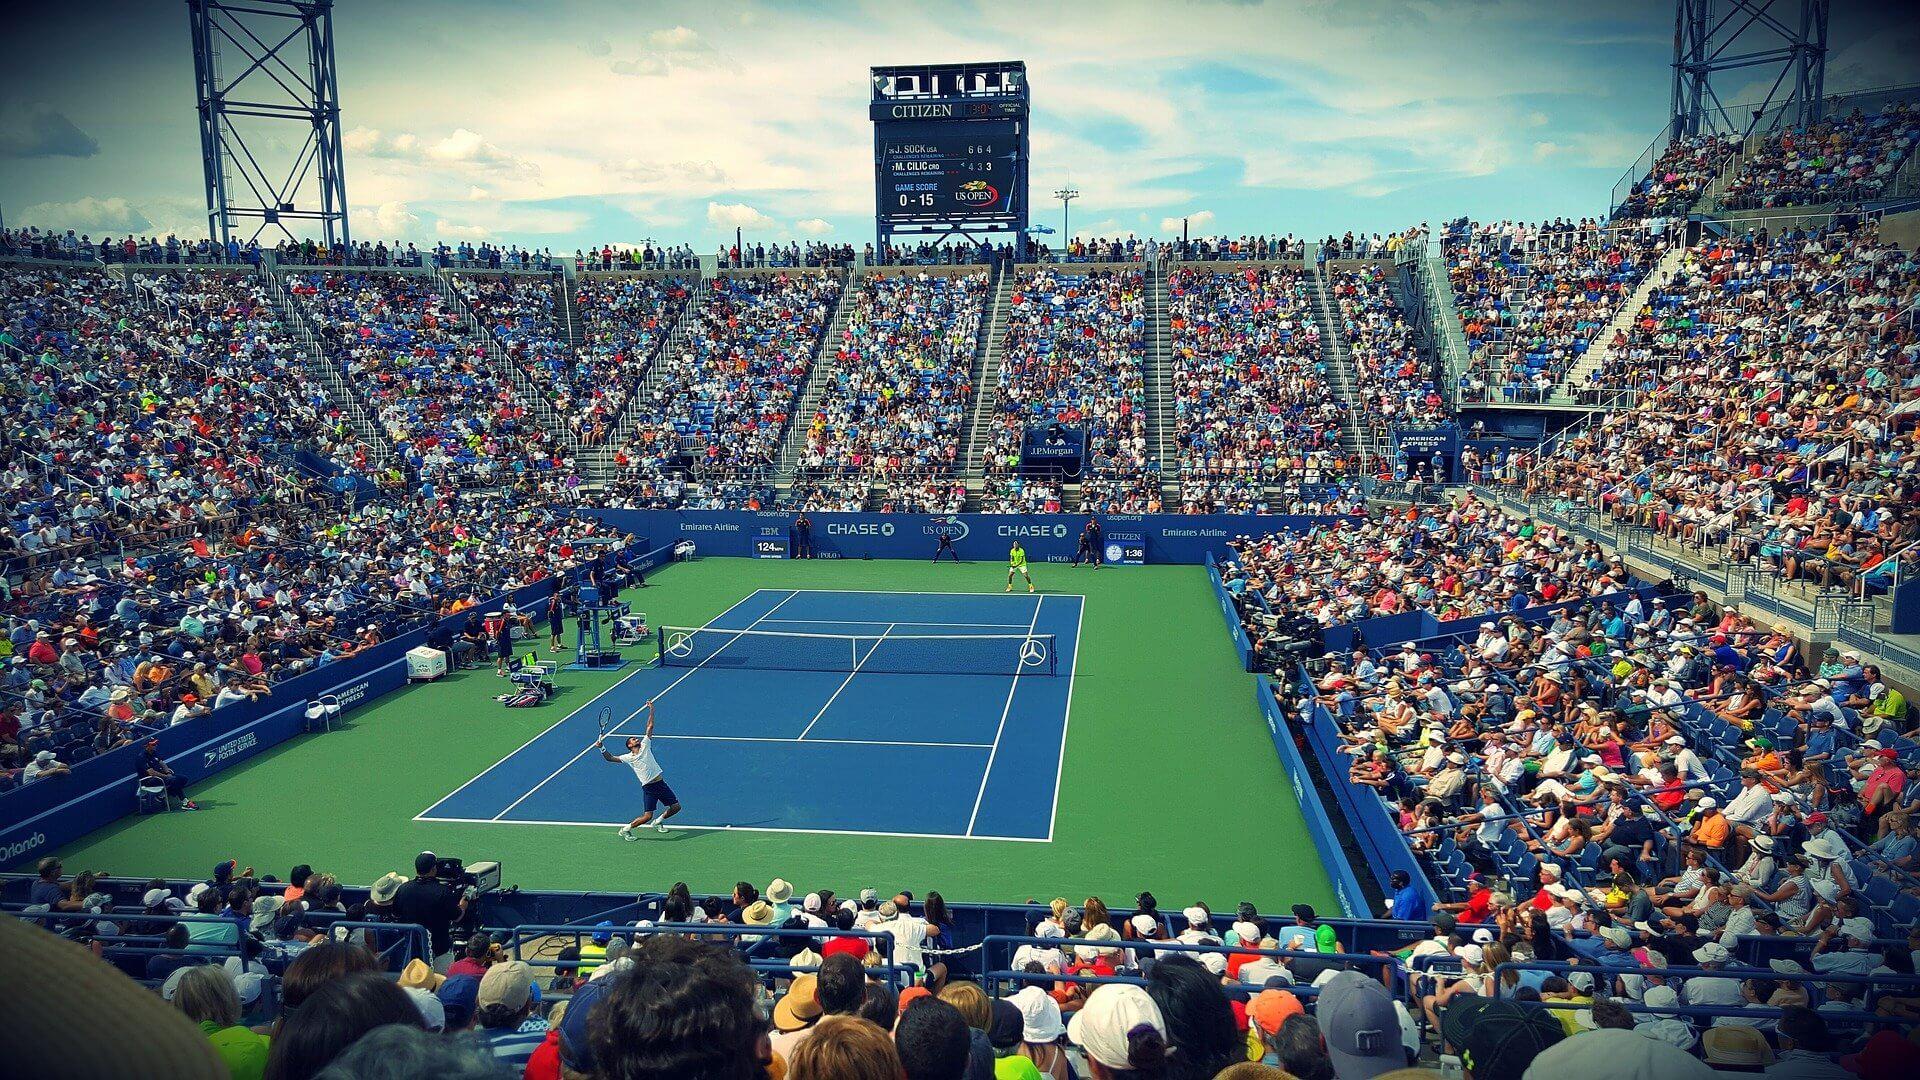 Tennis-Stadion